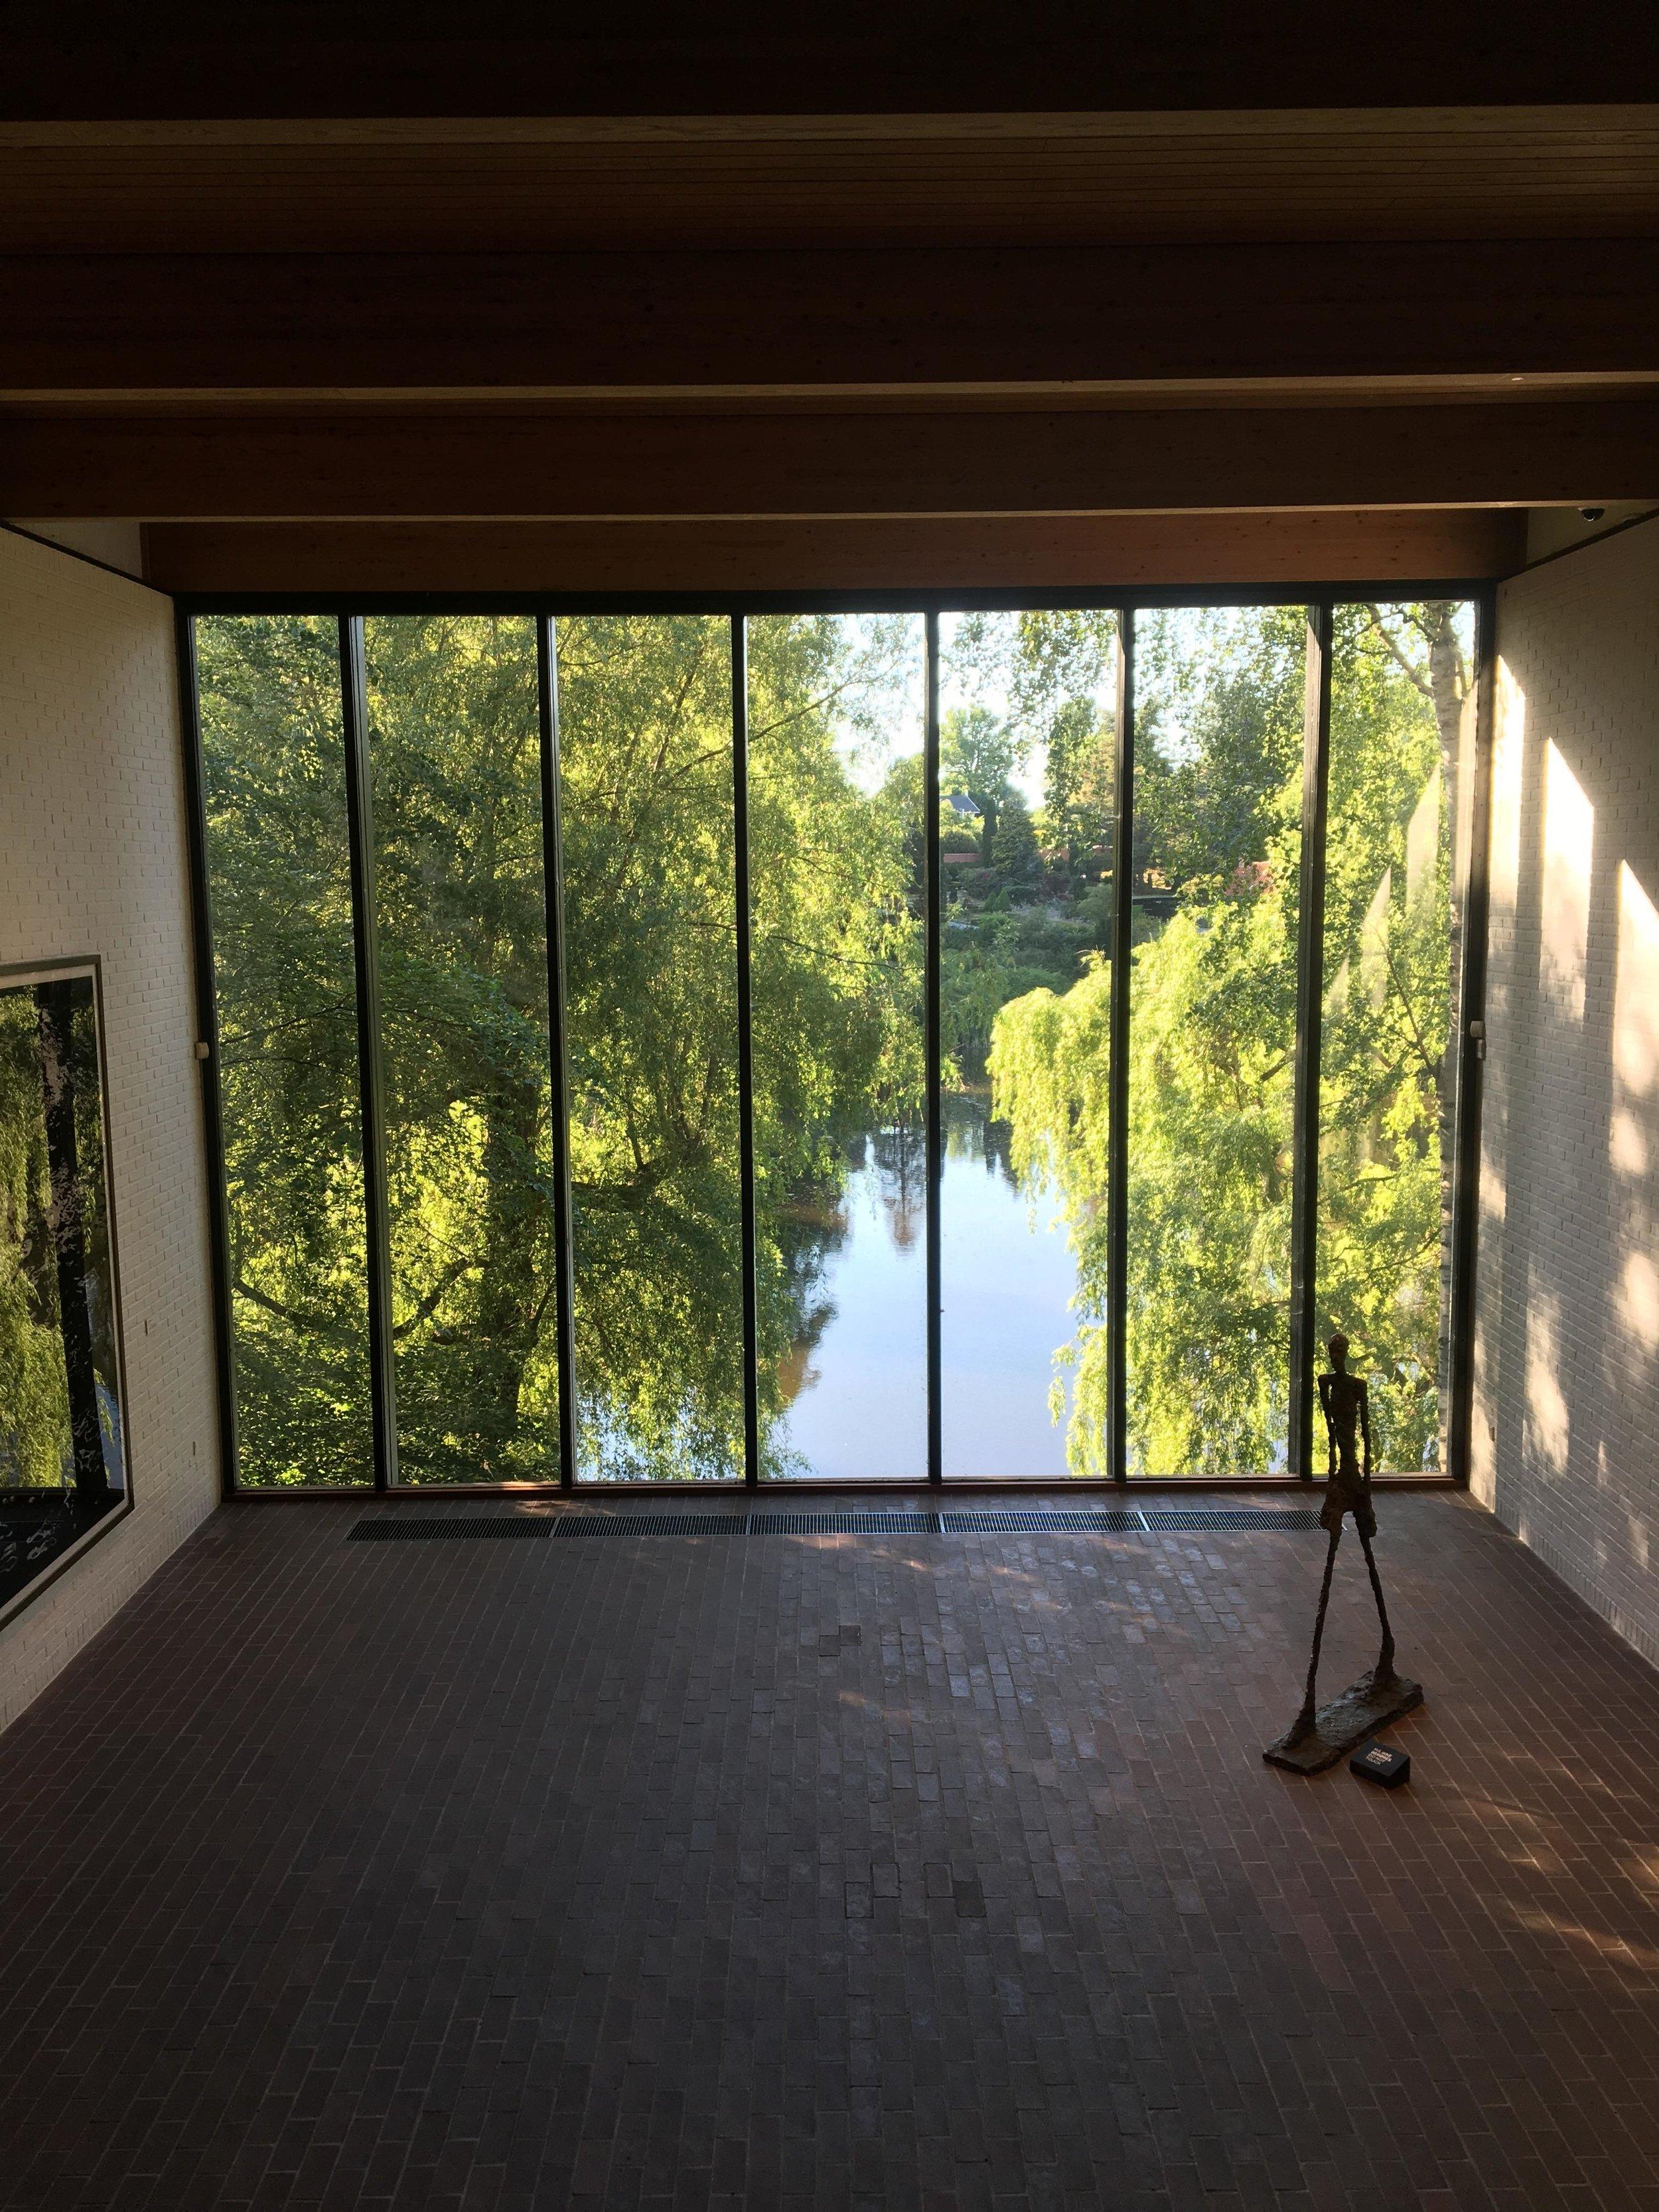 Foto: Tamia Guevara Pettersen. Louisiana kunstmuseum i København.